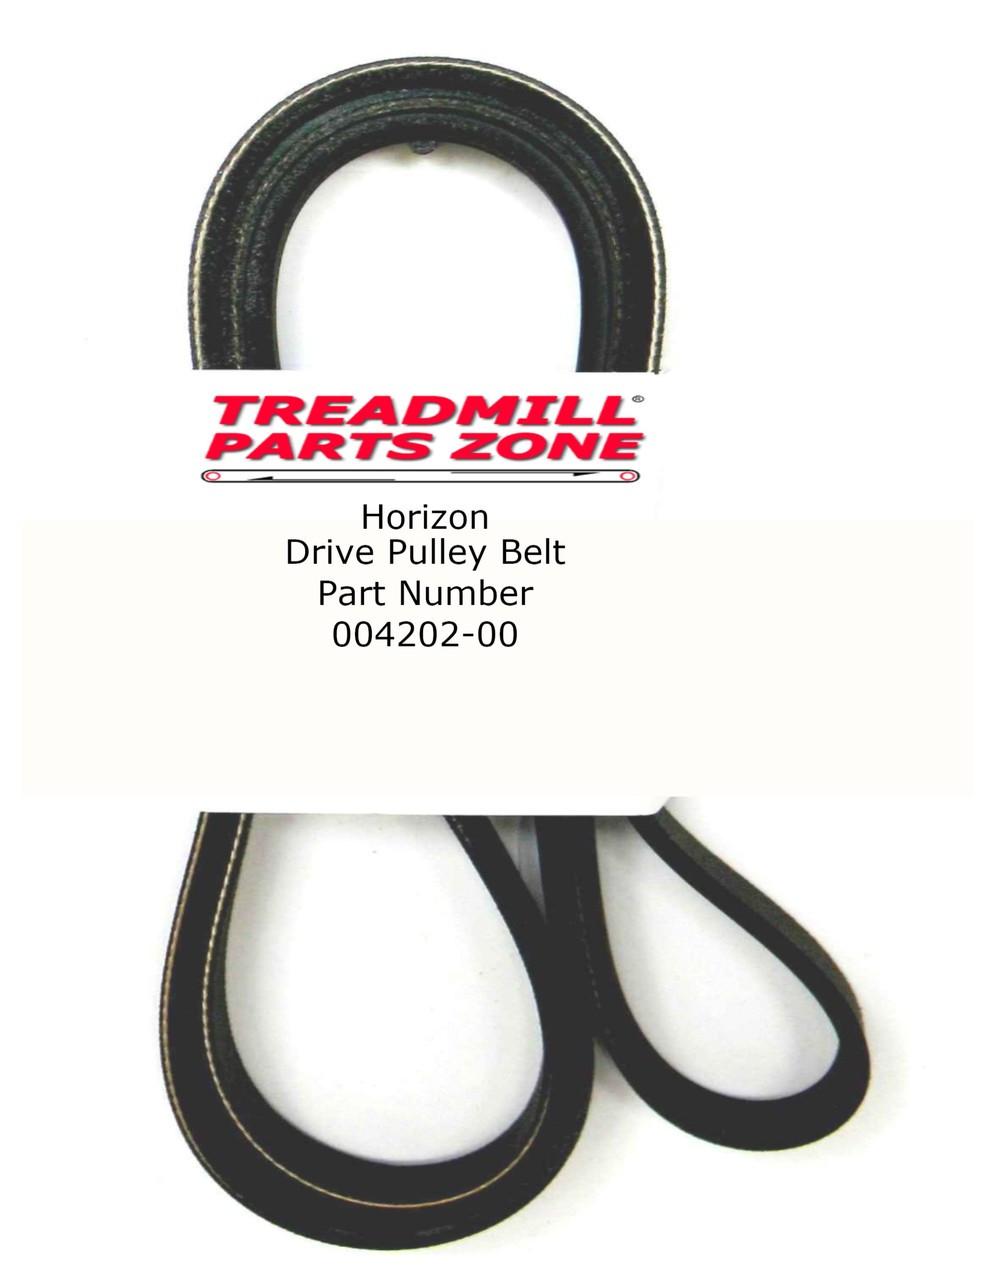 Horizon Bike Drive Pulley Belt Part Number 004202-00